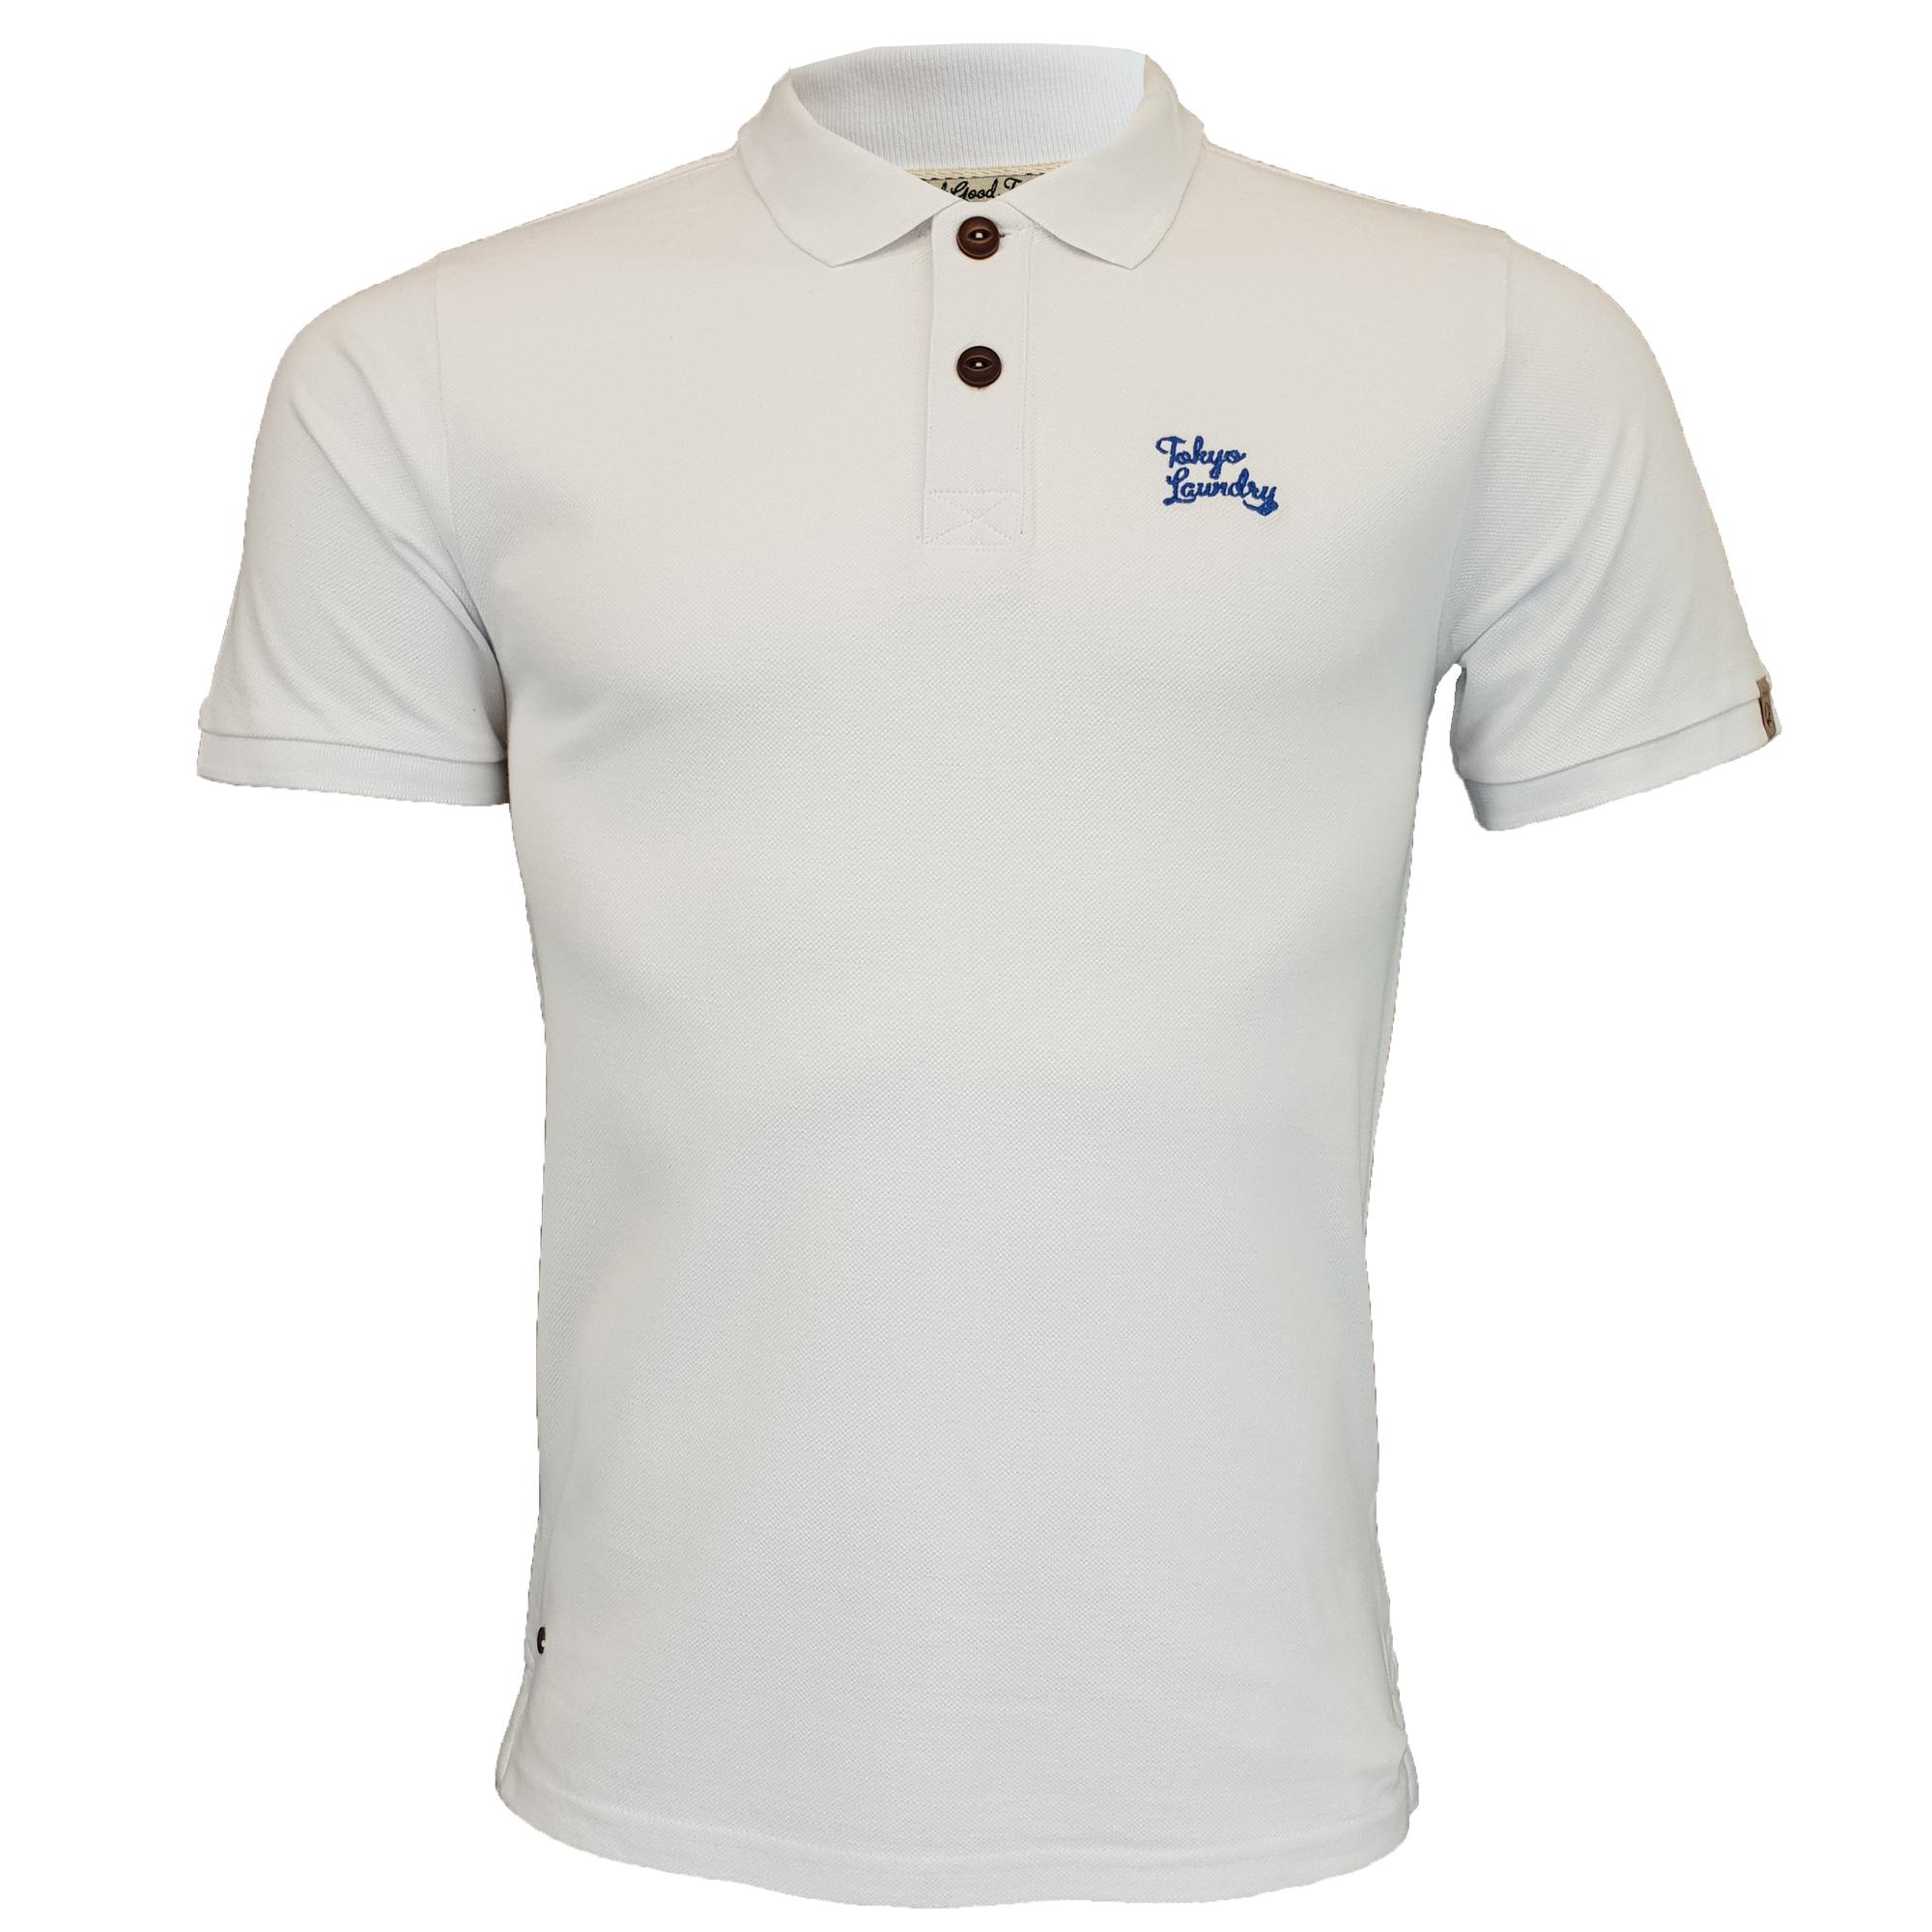 Mens-Pique-Polo-T-Shirt-Tokyo-Laundry-Florenzi-Short-Sleeved-Top-Casual-Summer thumbnail 25